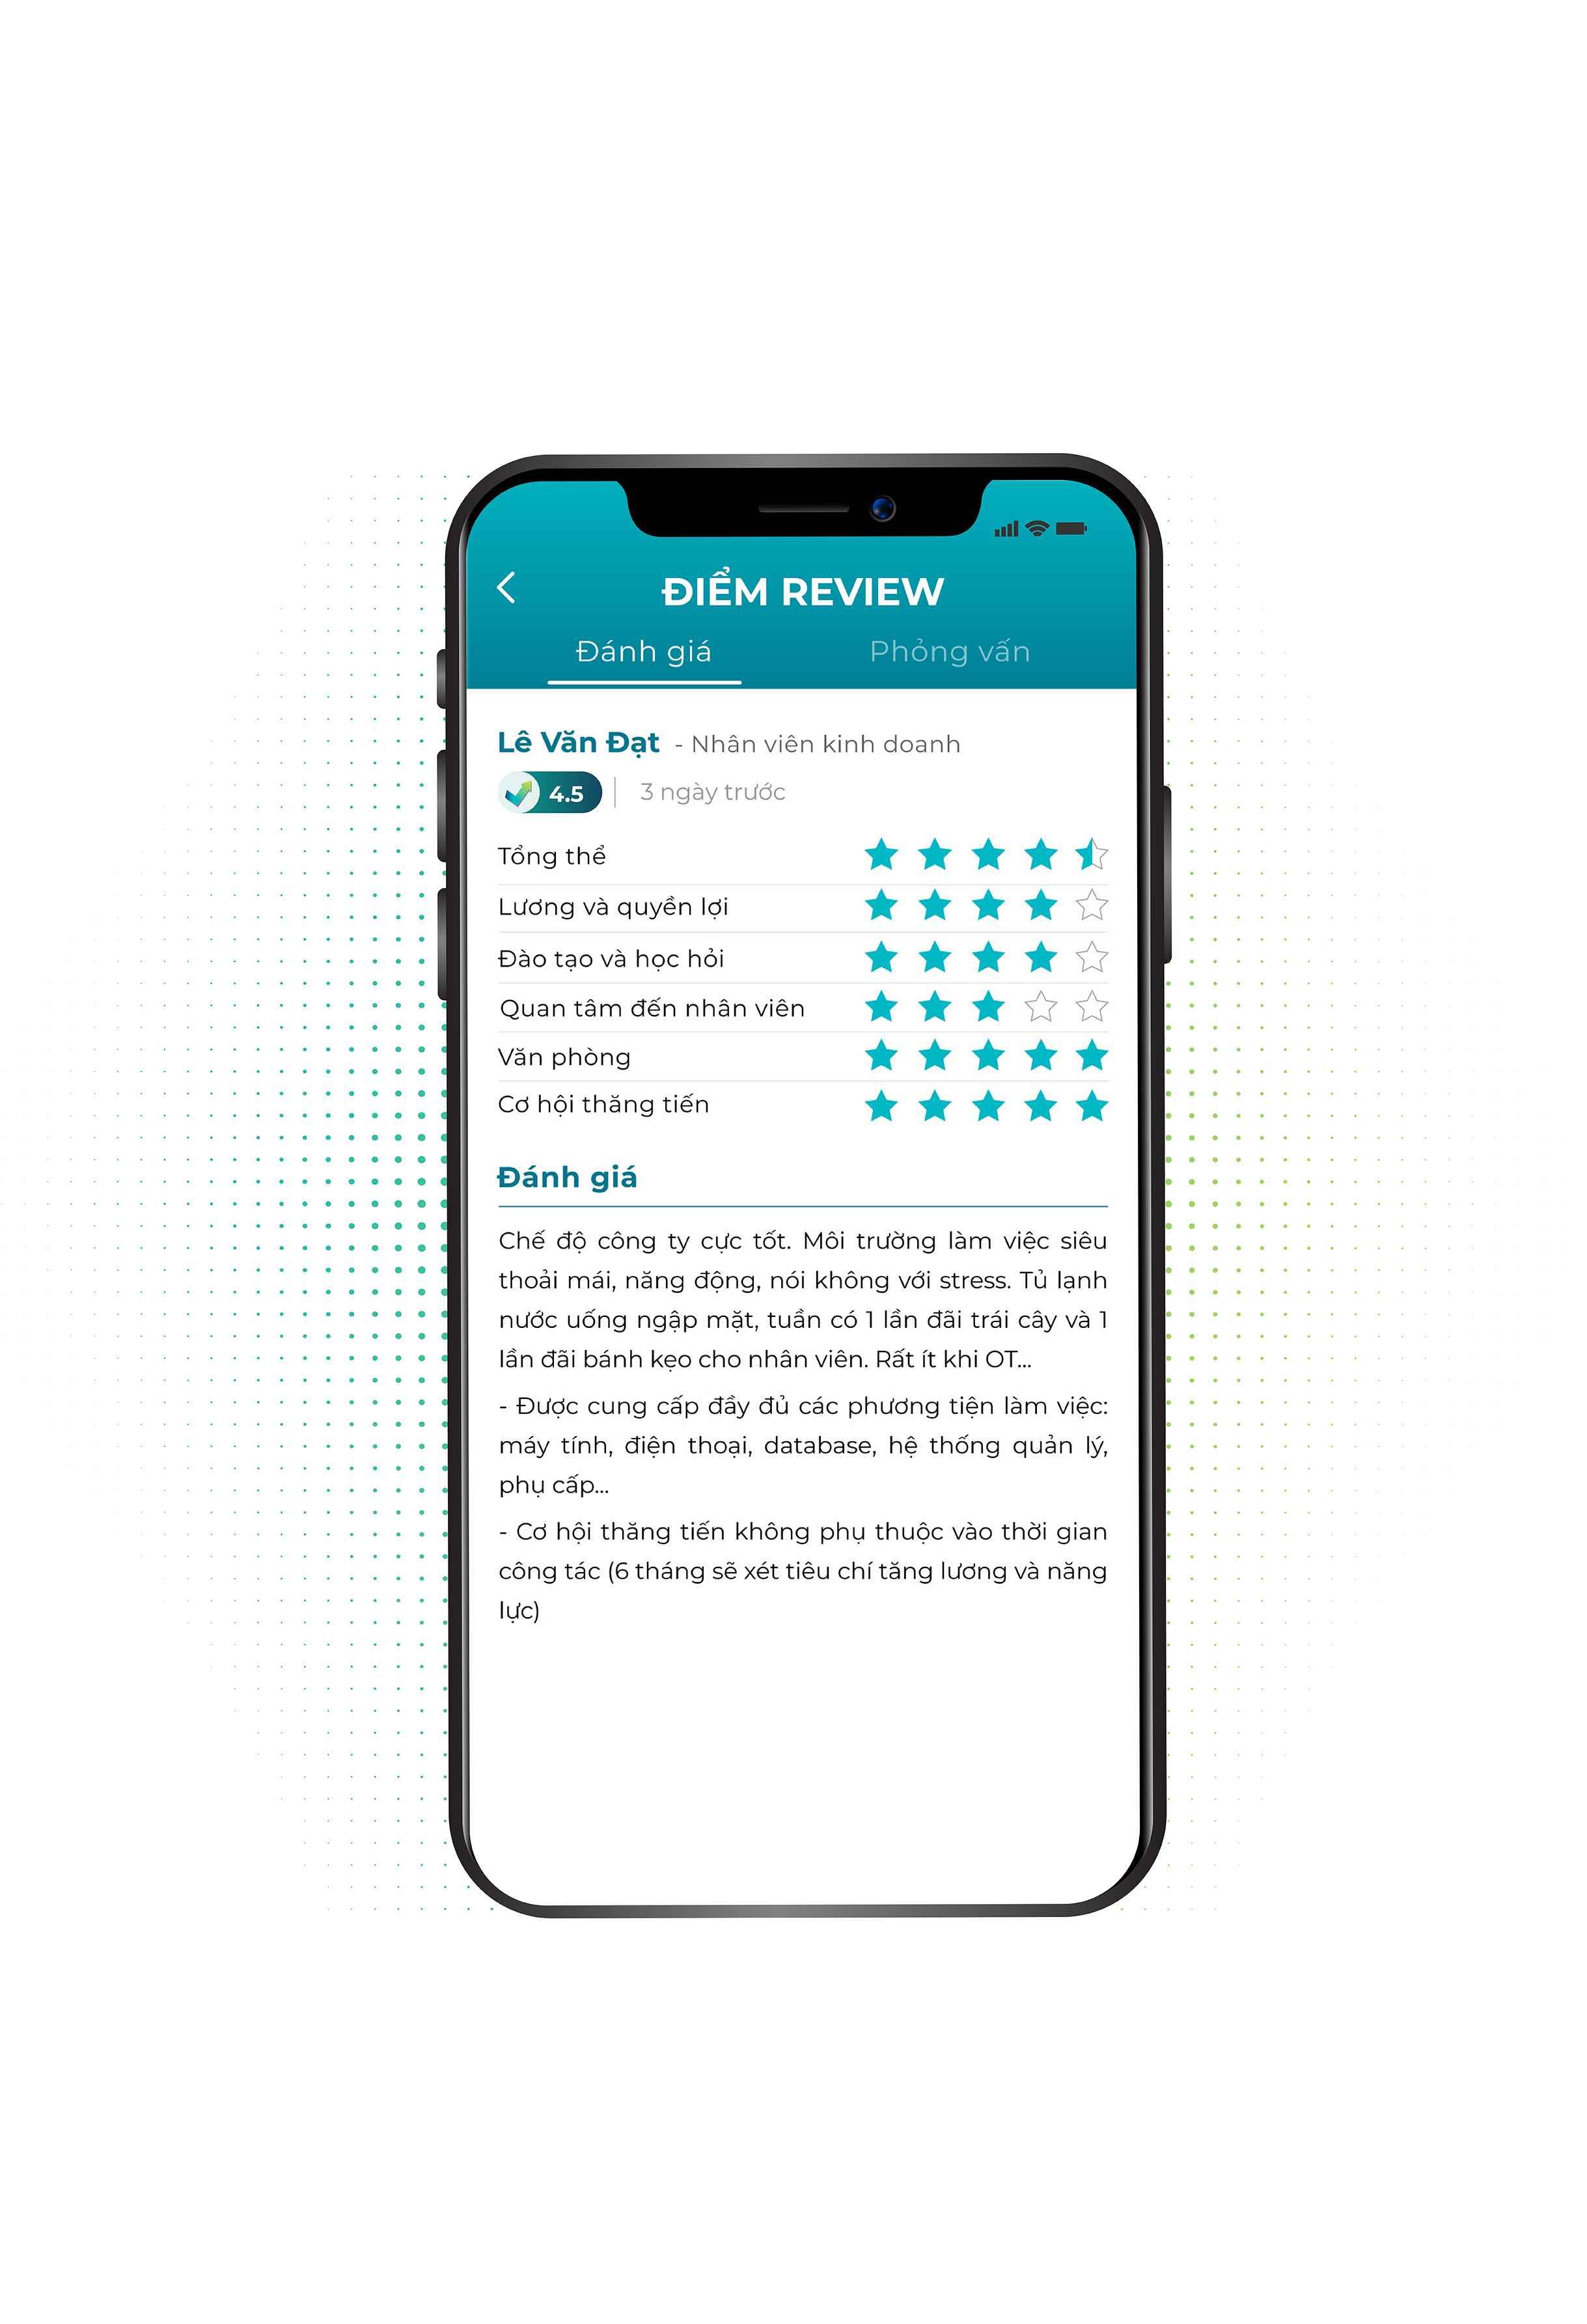 Điểm review